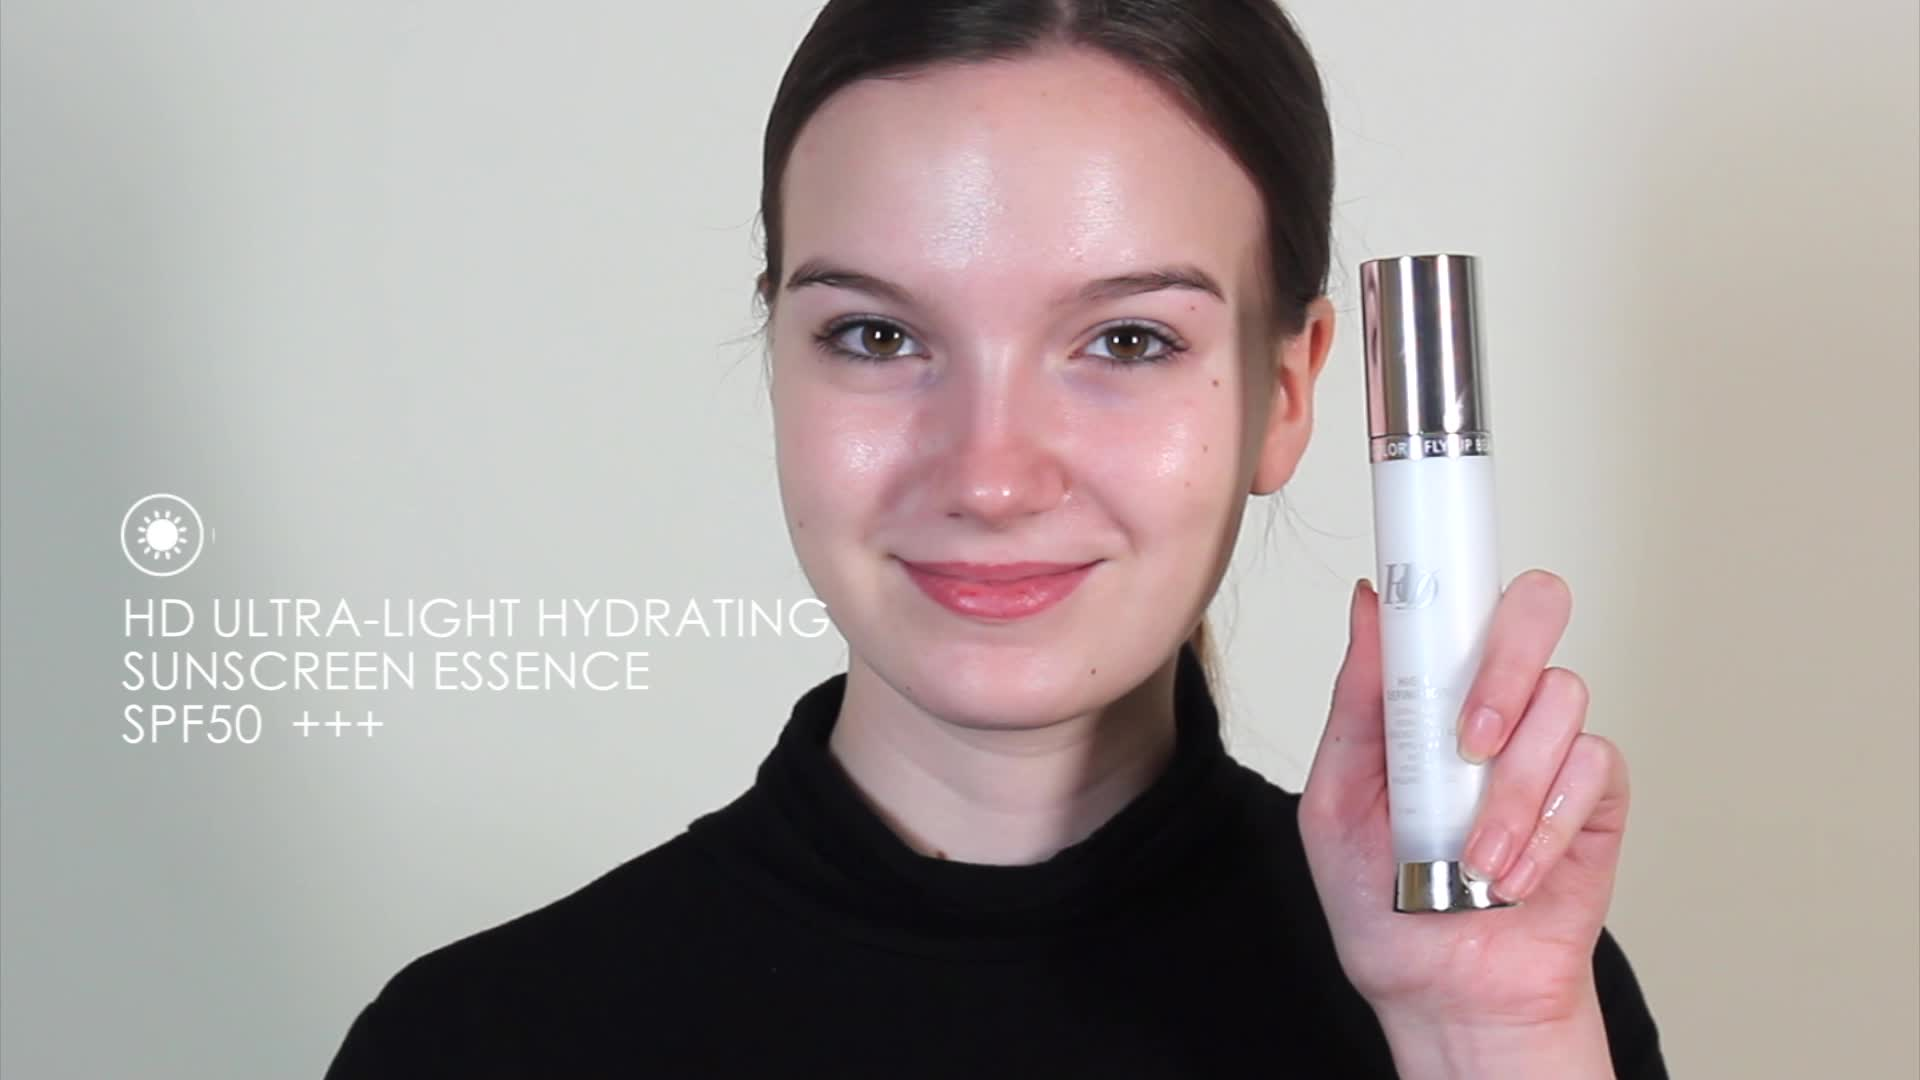 FLY UP cosmetics face sunscreen cream SPF50